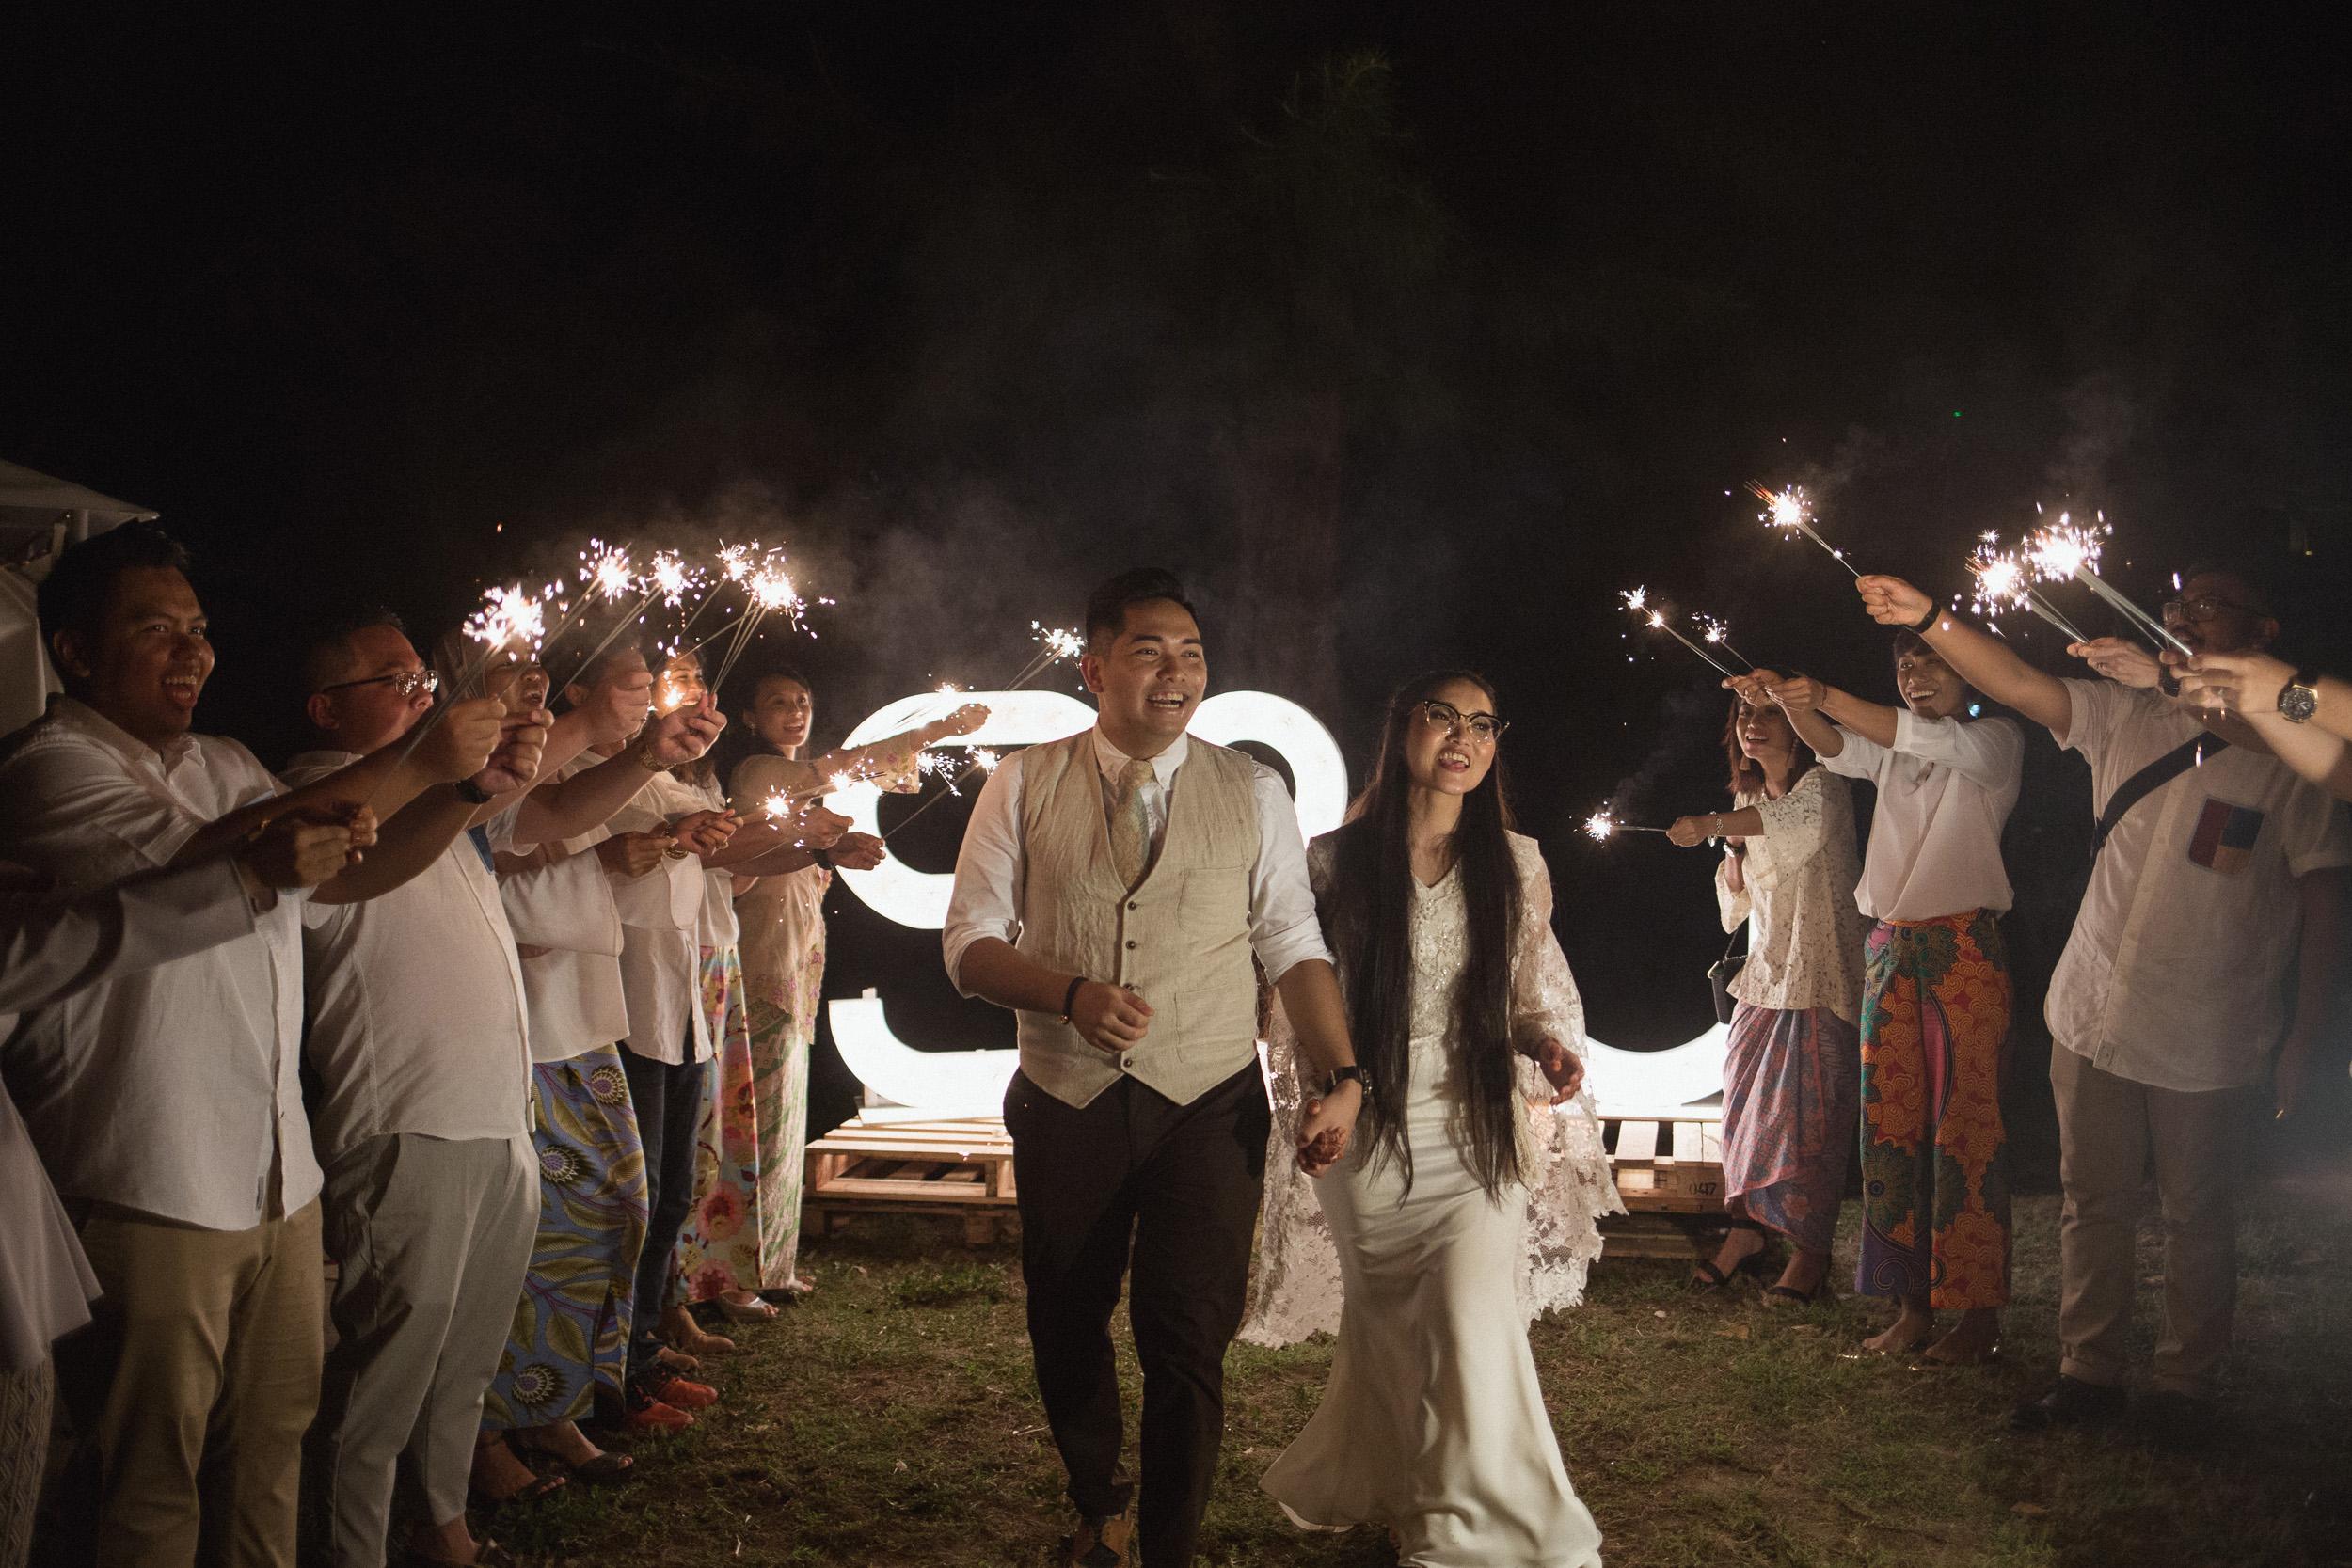 singapore-wedding-photographer-photography-wmt2017-161.jpg